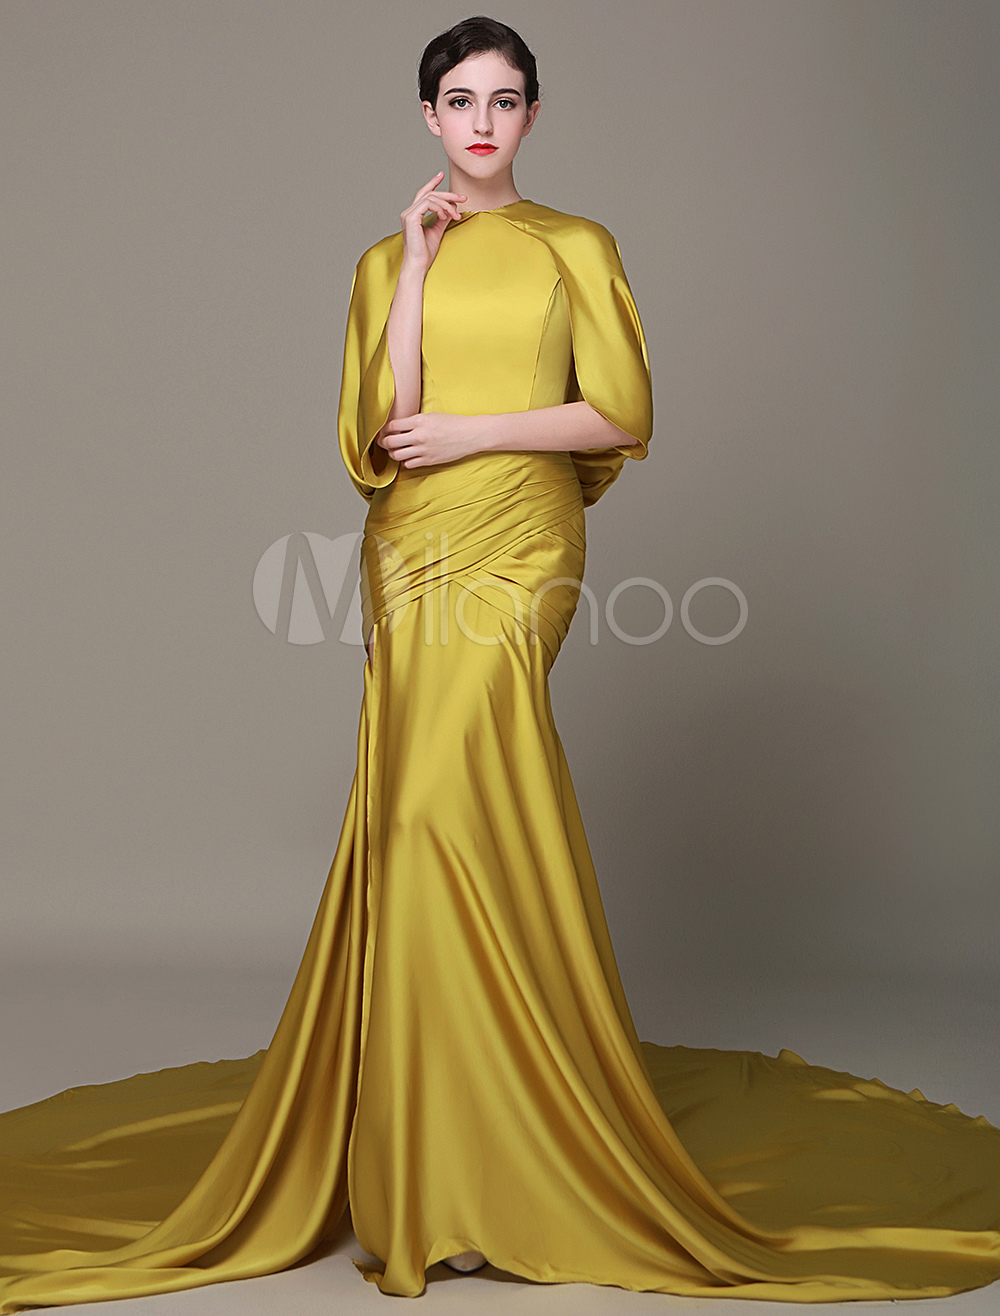 Golden Satin Evening Dress High Split Prom Dress 2018 Chaple Train Red Carpet Dress With Cape Milanoo